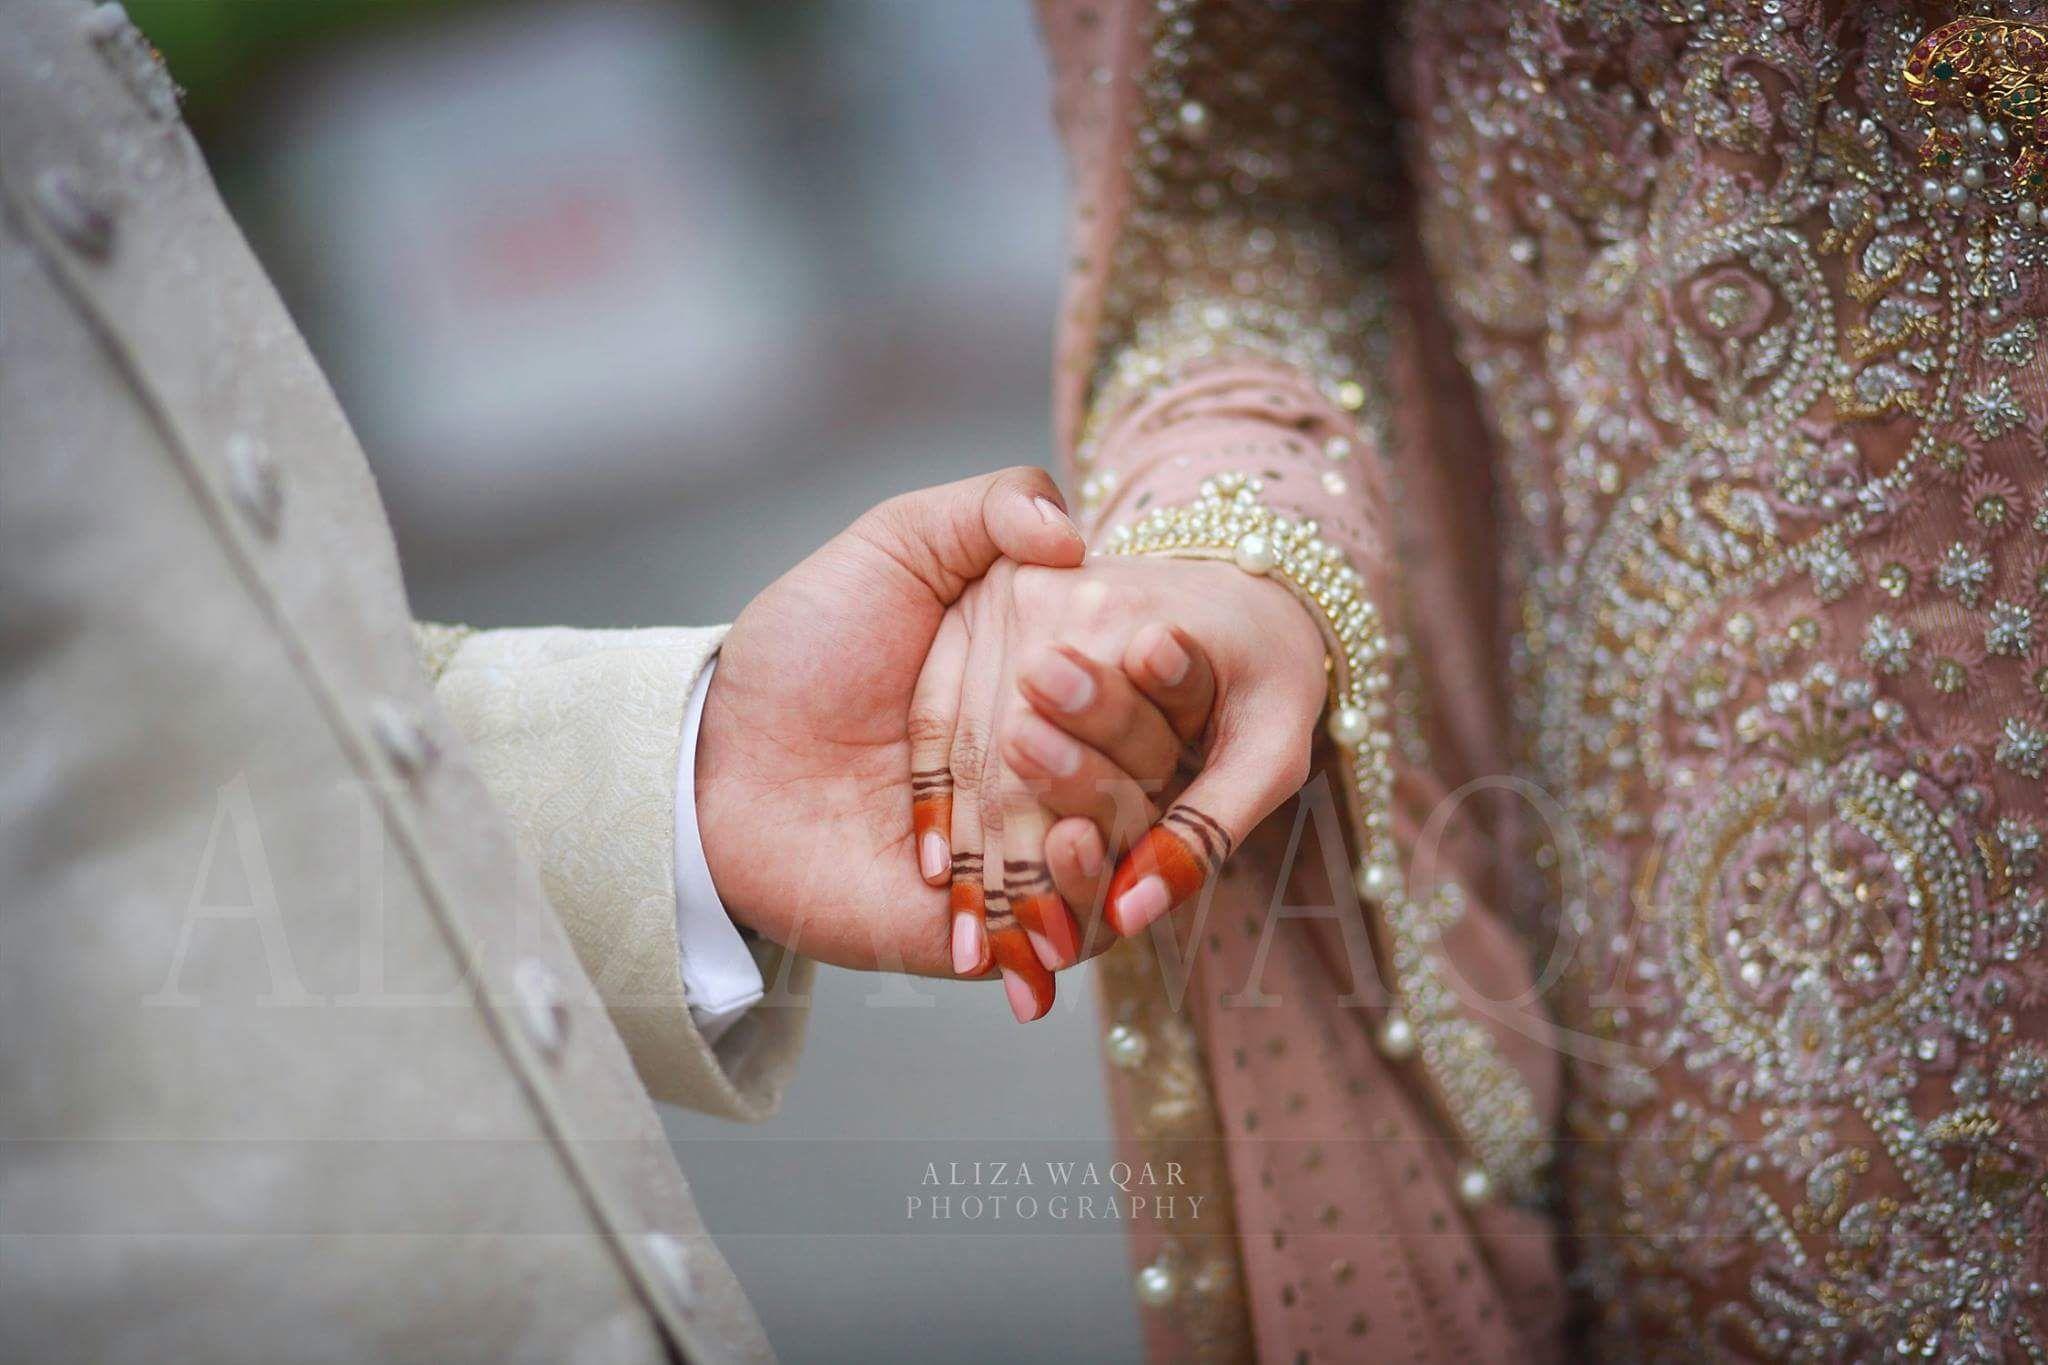 Mehndi Hands Couple : Photography by aliza waqar couples hand couple